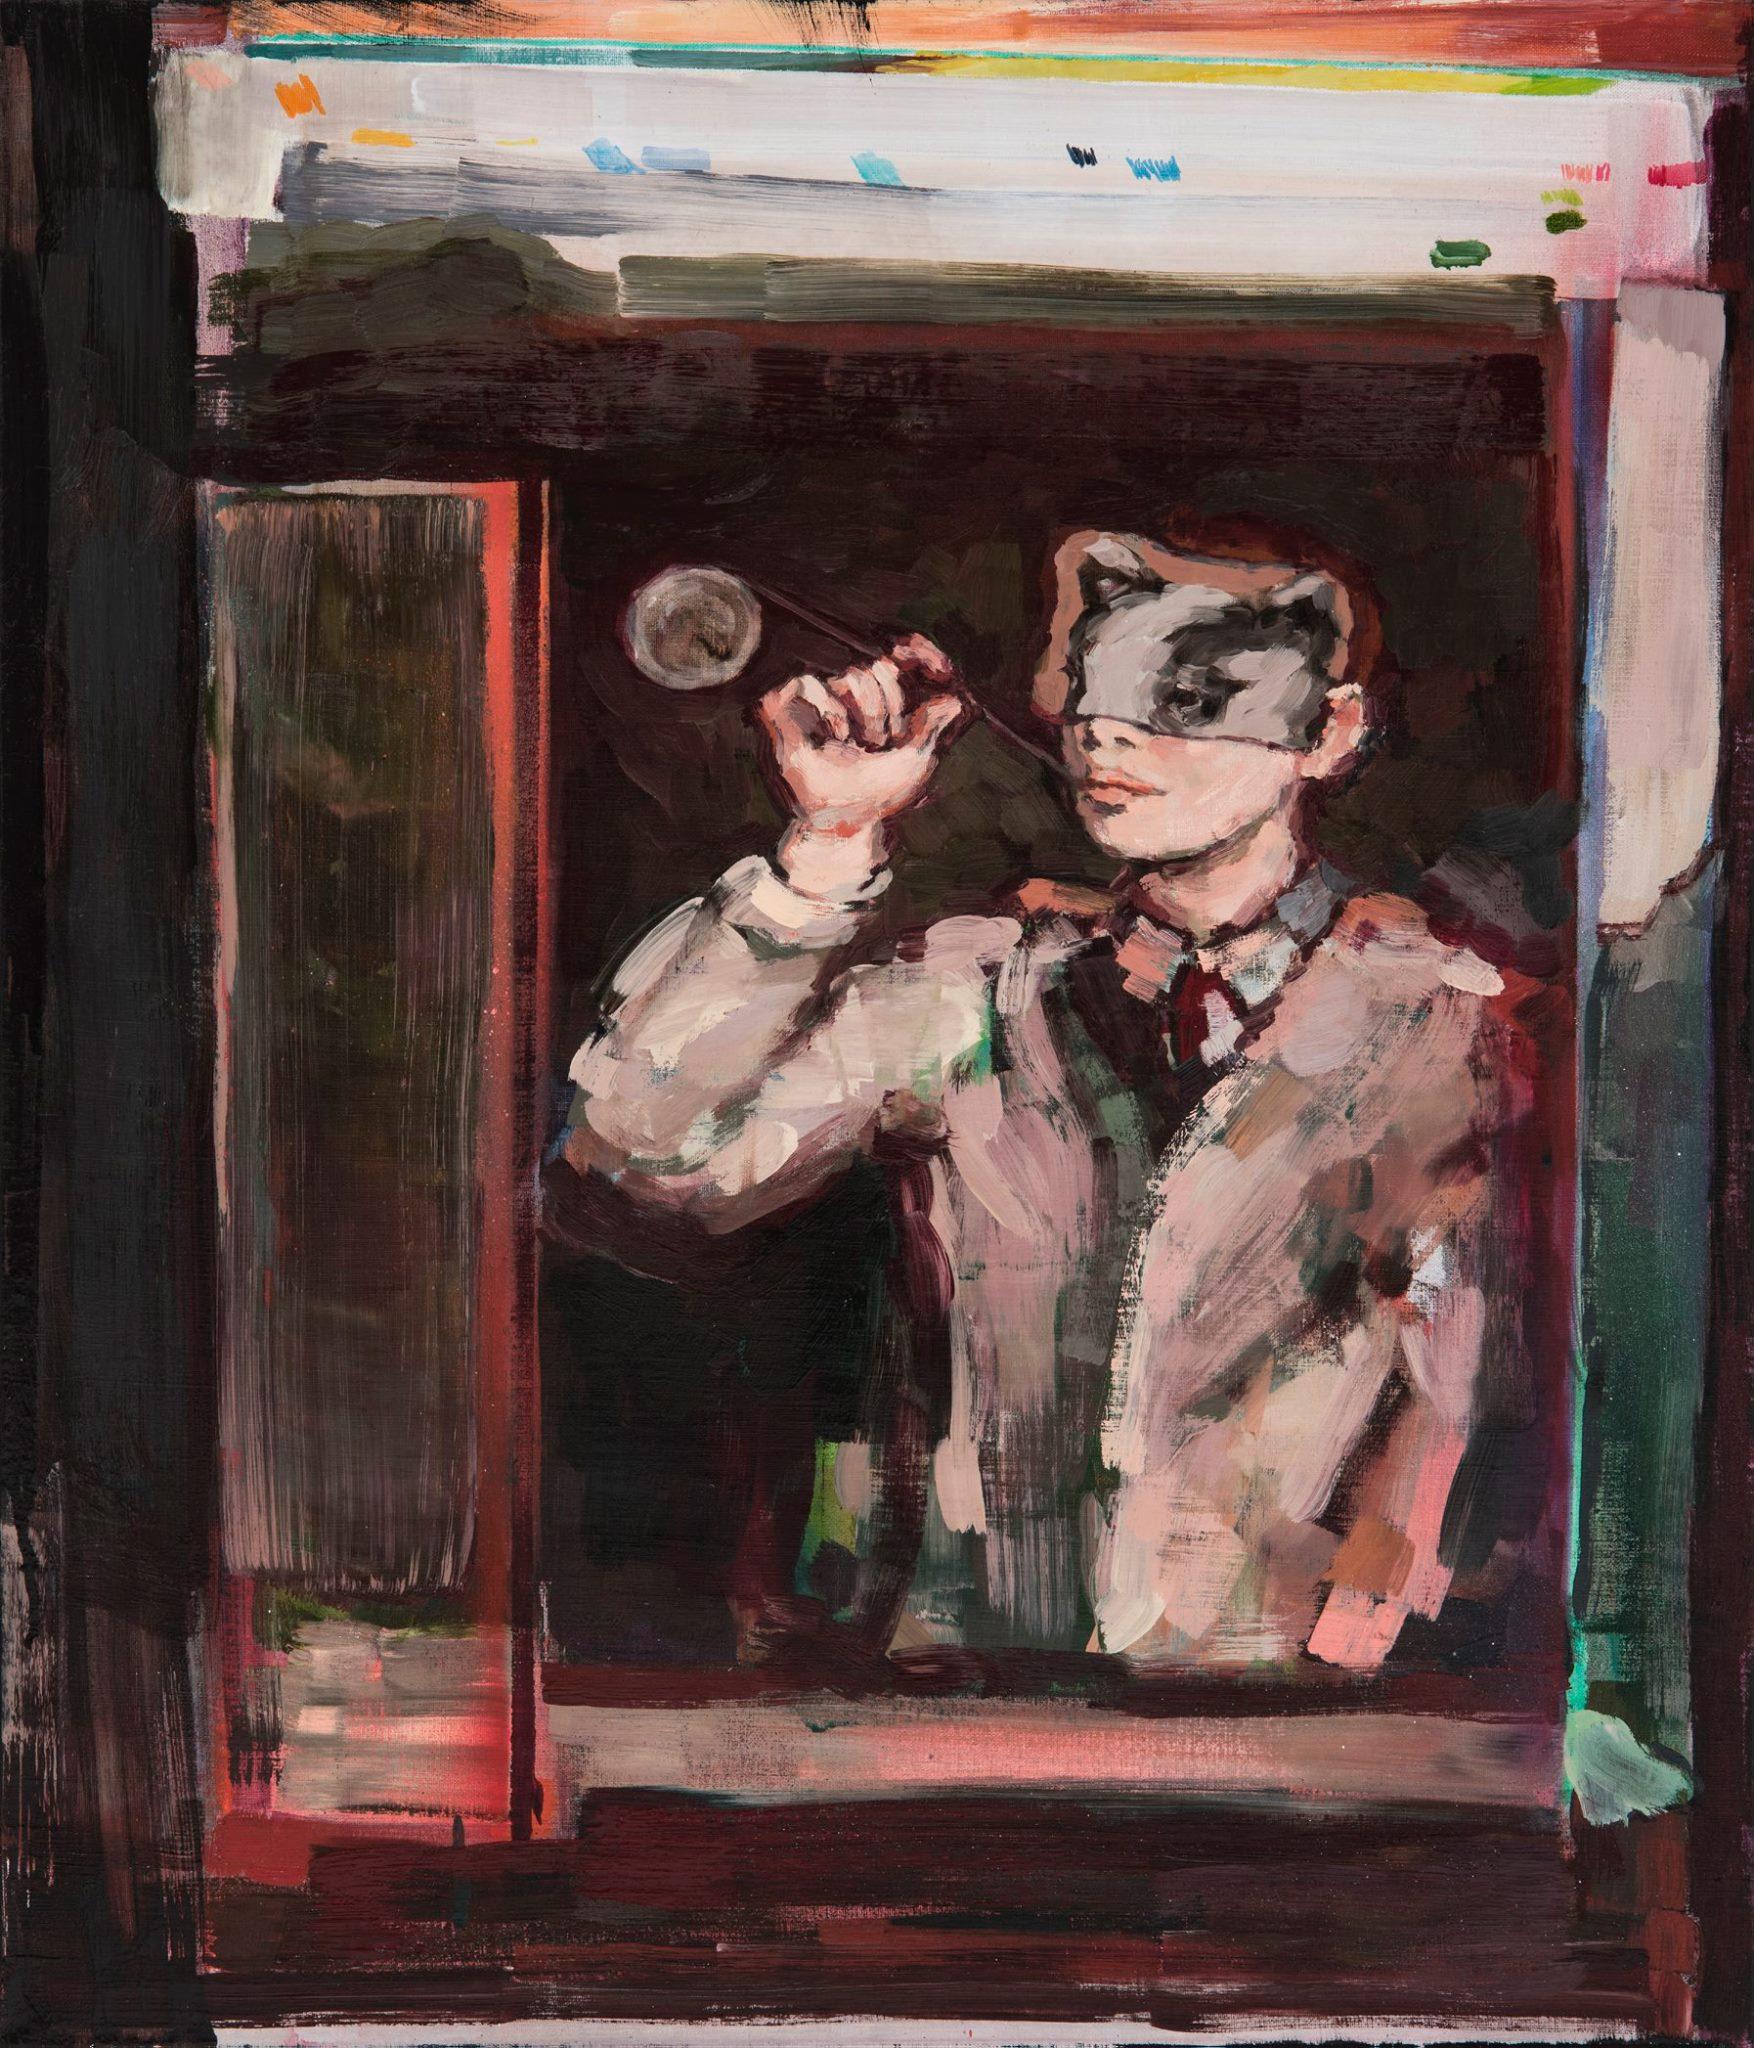 The Storyteller, oil, aerosol spray on canvas, 70x60, 2018